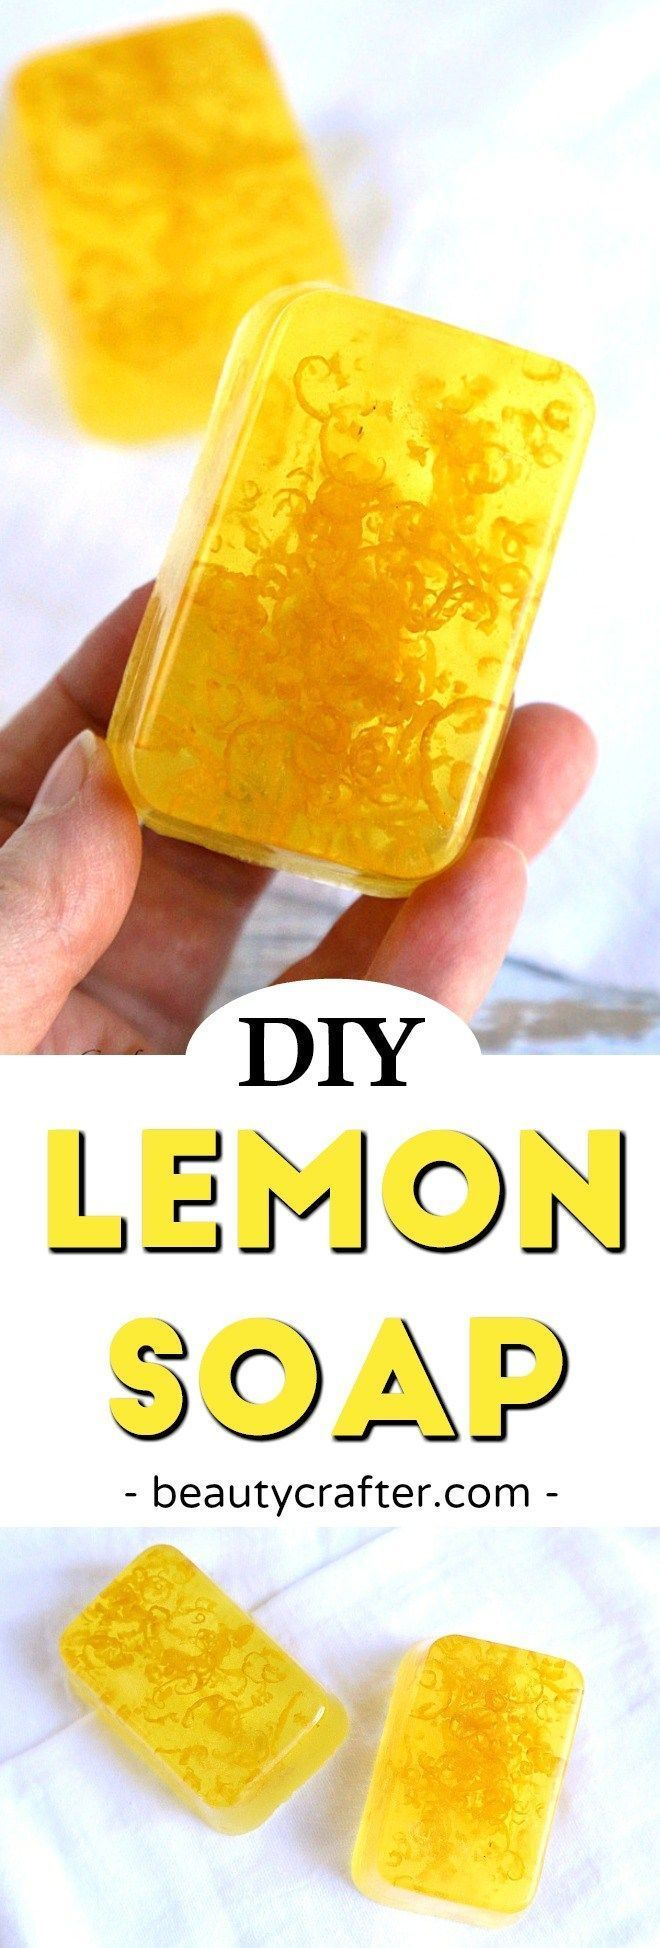 Lemon Soap - DIY Soap Recipe - Refreshing Lemon Zest soap makes a great DIY gift! #soap #soapmaking #crafts #diygifts #MothersDay #lemon